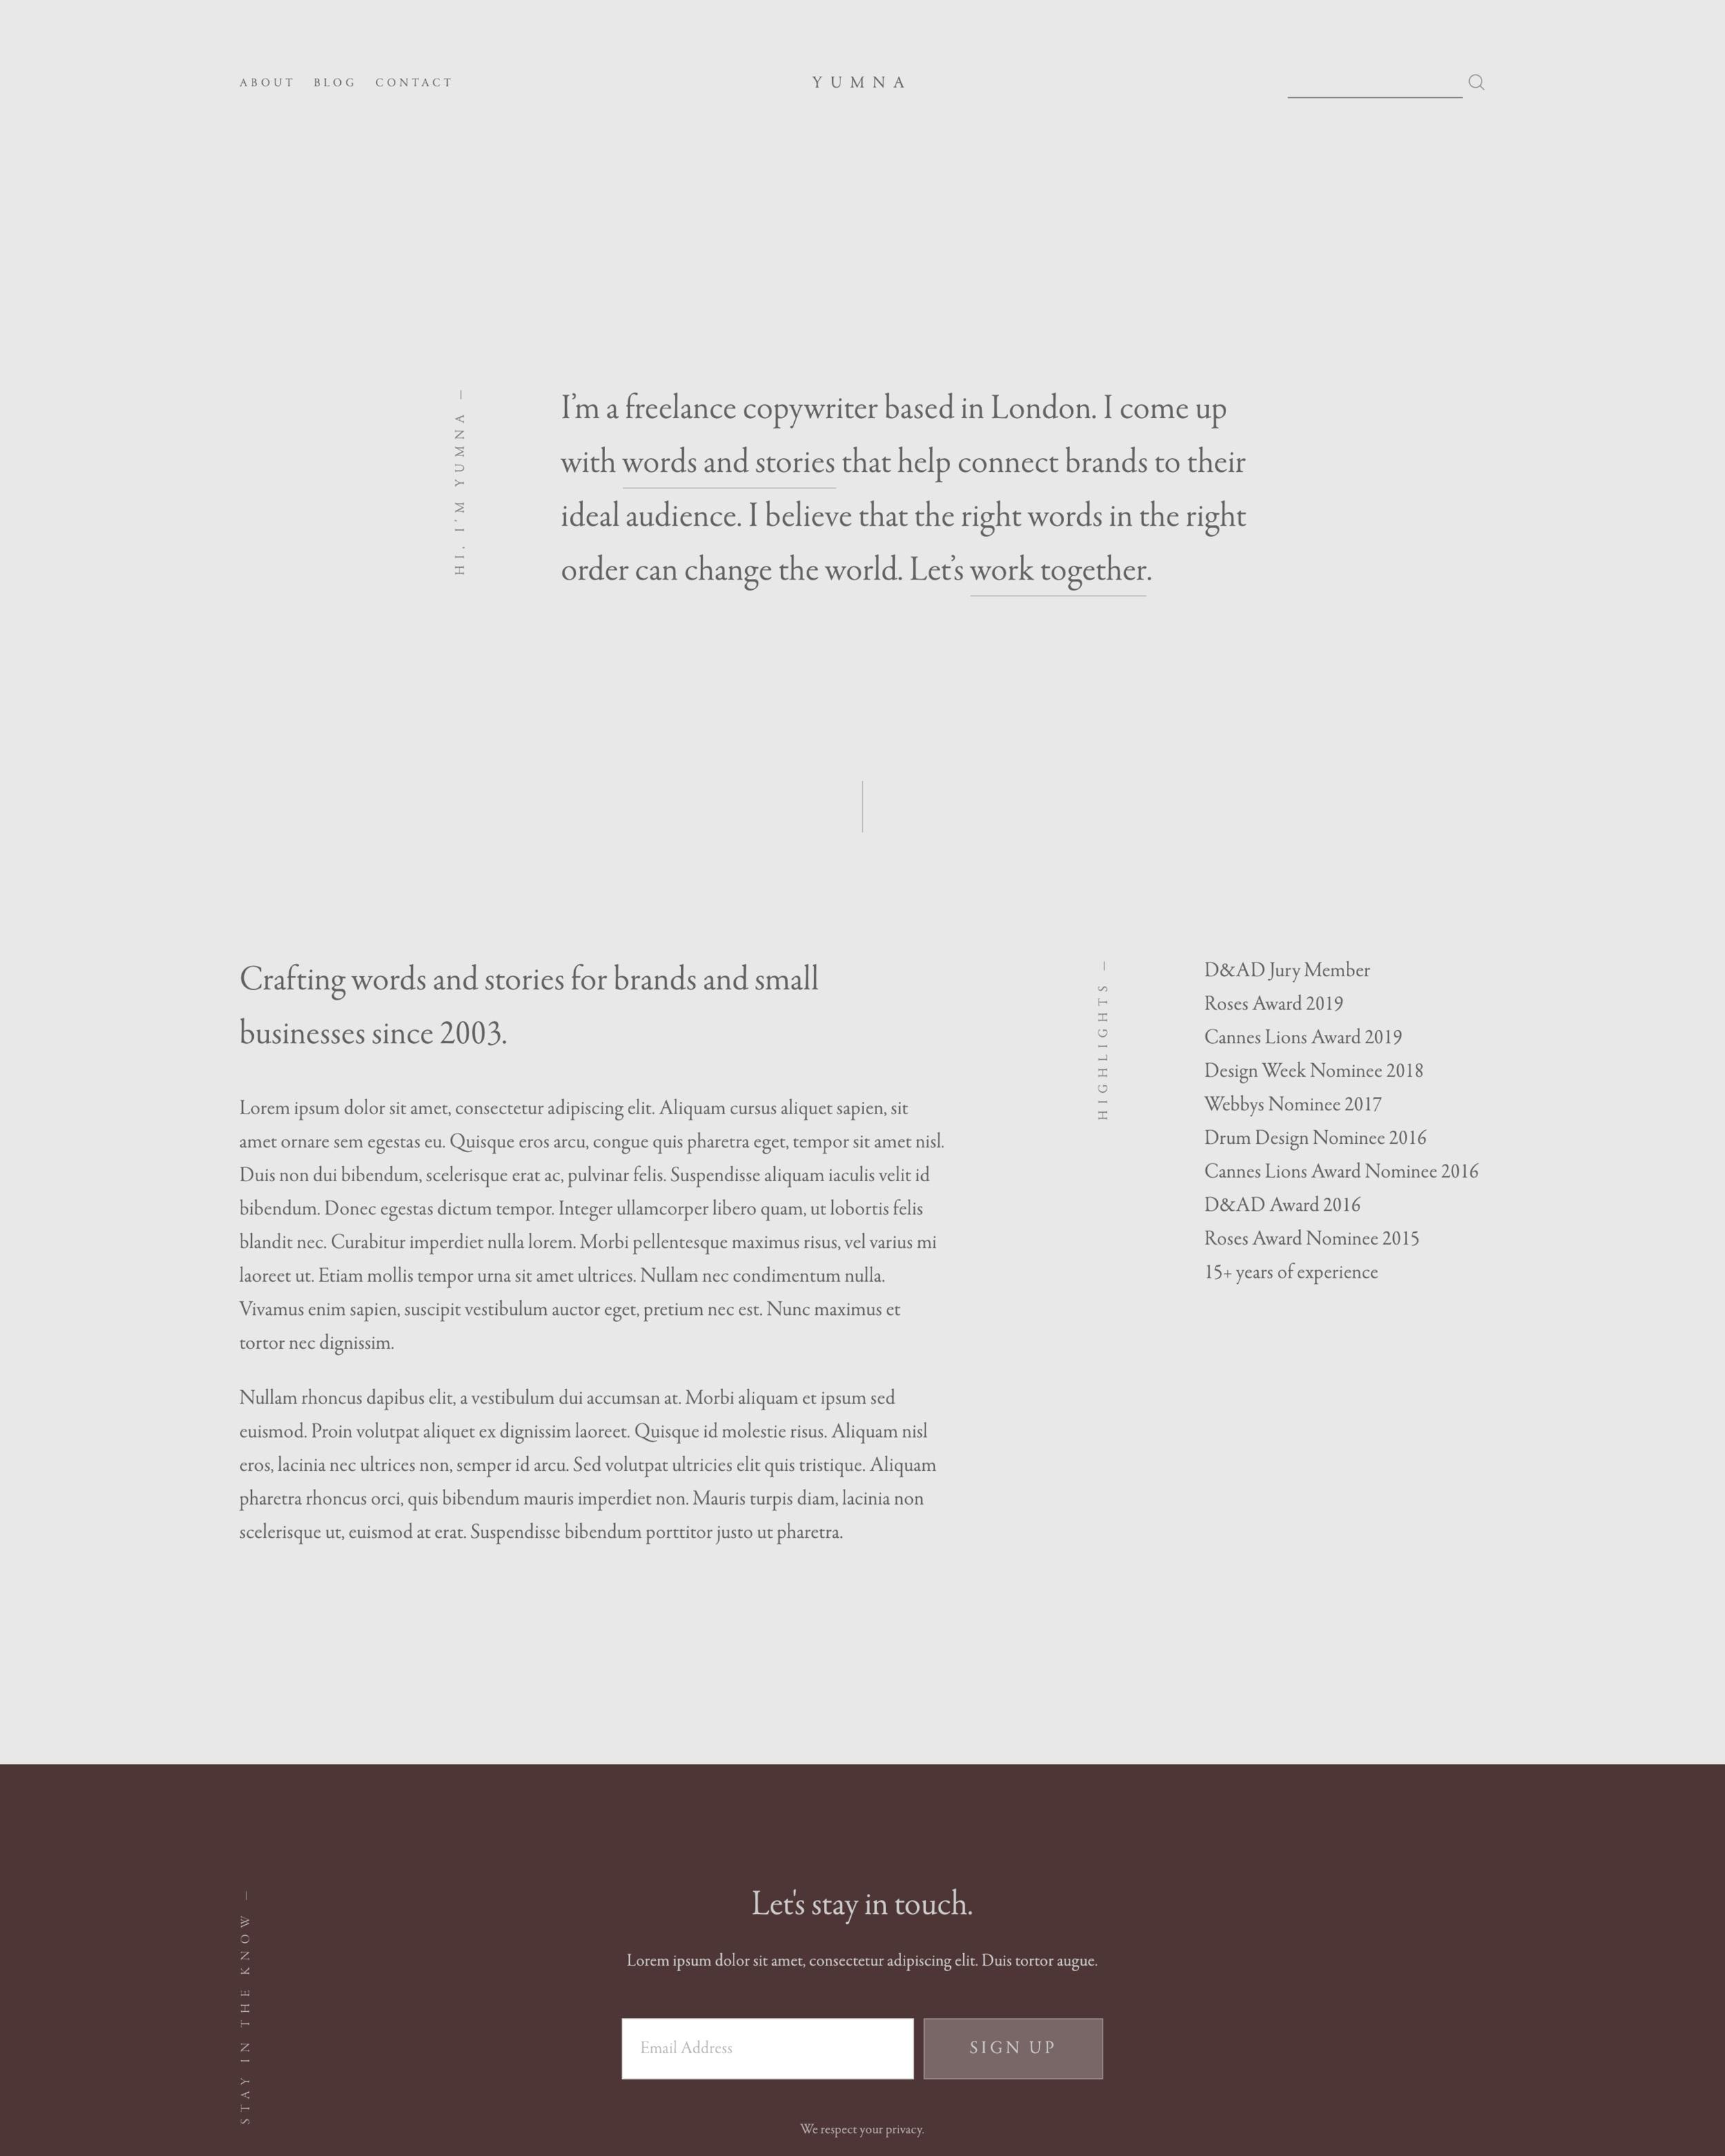 screencapture-dandelion-turbot-c3sy-squarespace-2019-07-03-20_49_19.jpg